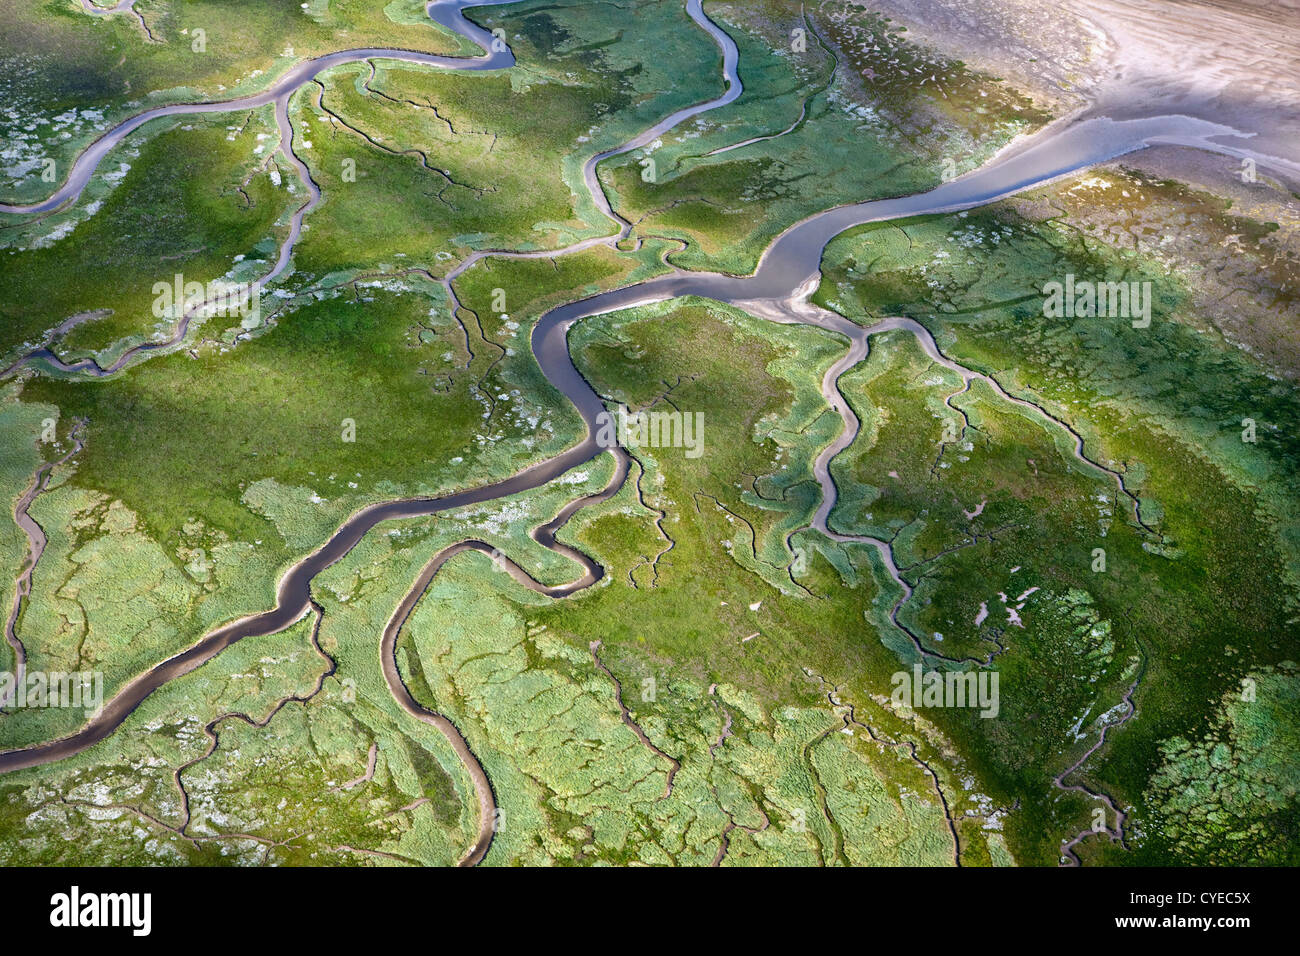 Schiermonnikoog Island belonging to Wadden Sea Islands. UNESCO World Heritage Site. Aerial. Marsh land, mud flats. - Stock Image